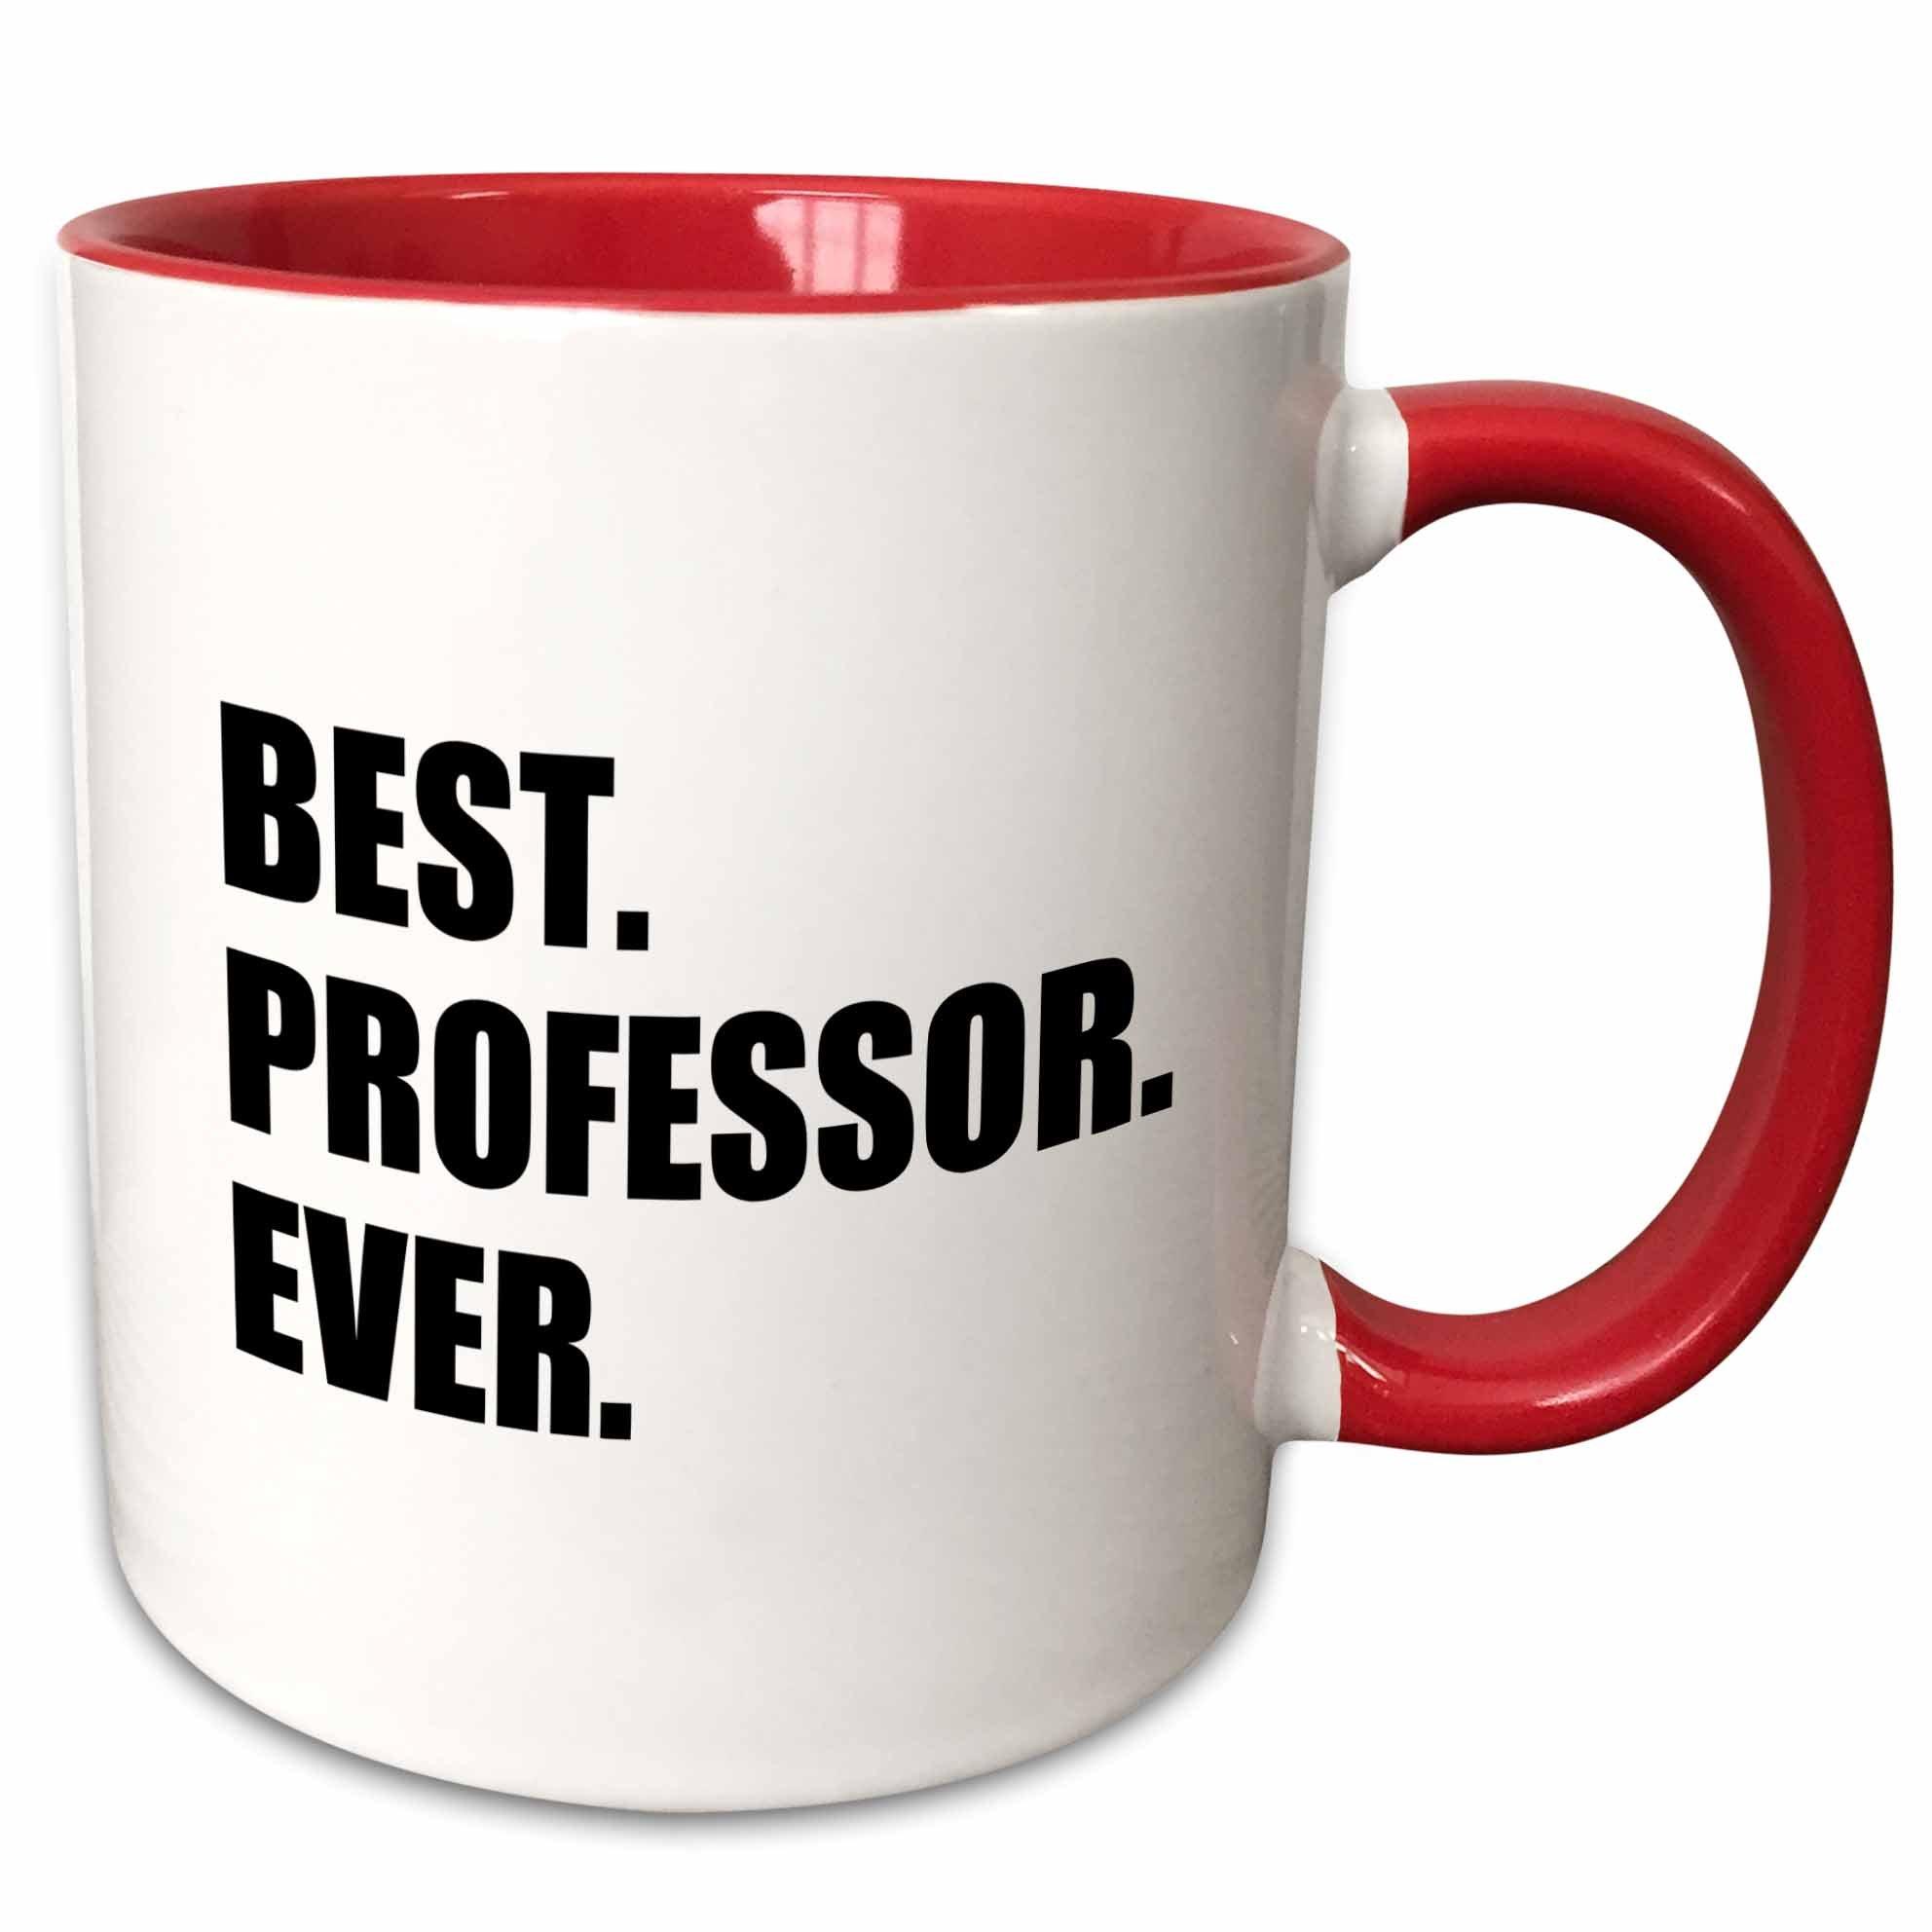 3dRose mug_185014_5 Best Professor Ever, gift for inspiring college university lecturers - Two Tone Red Mug, 11oz